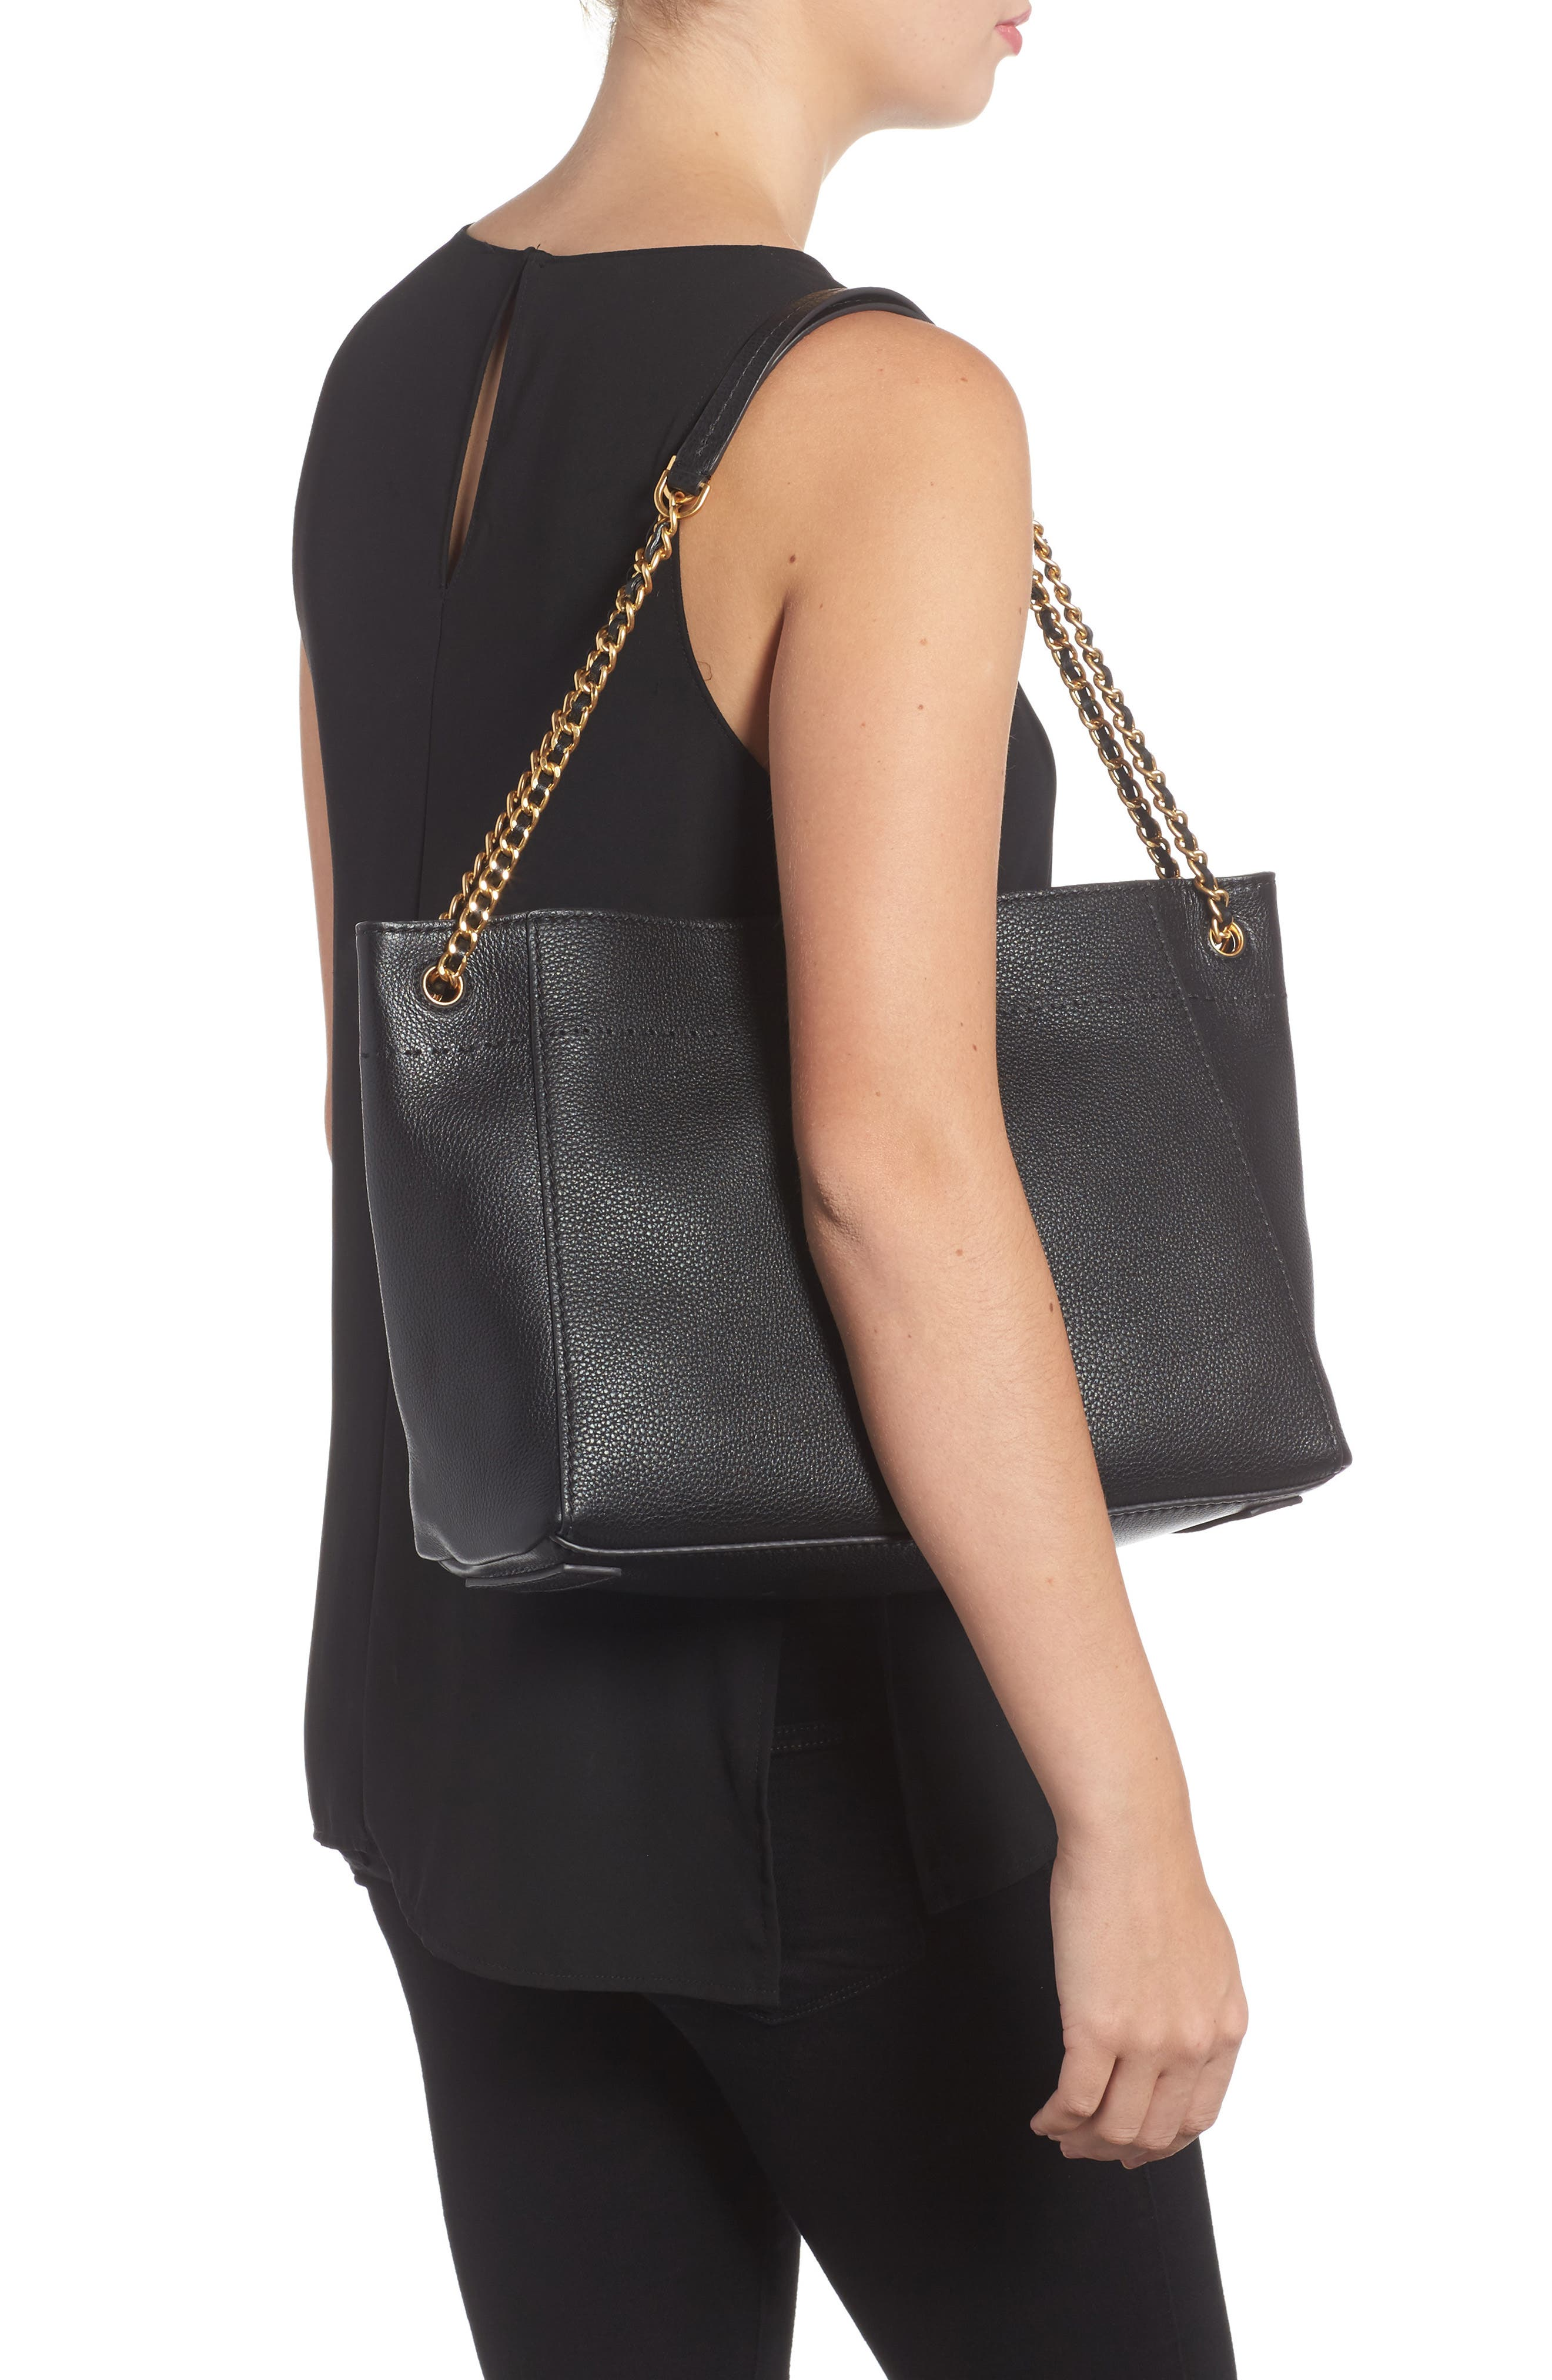 McGraw Slouchy Leather Shoulder Bag,                             Alternate thumbnail 2, color,                             Black